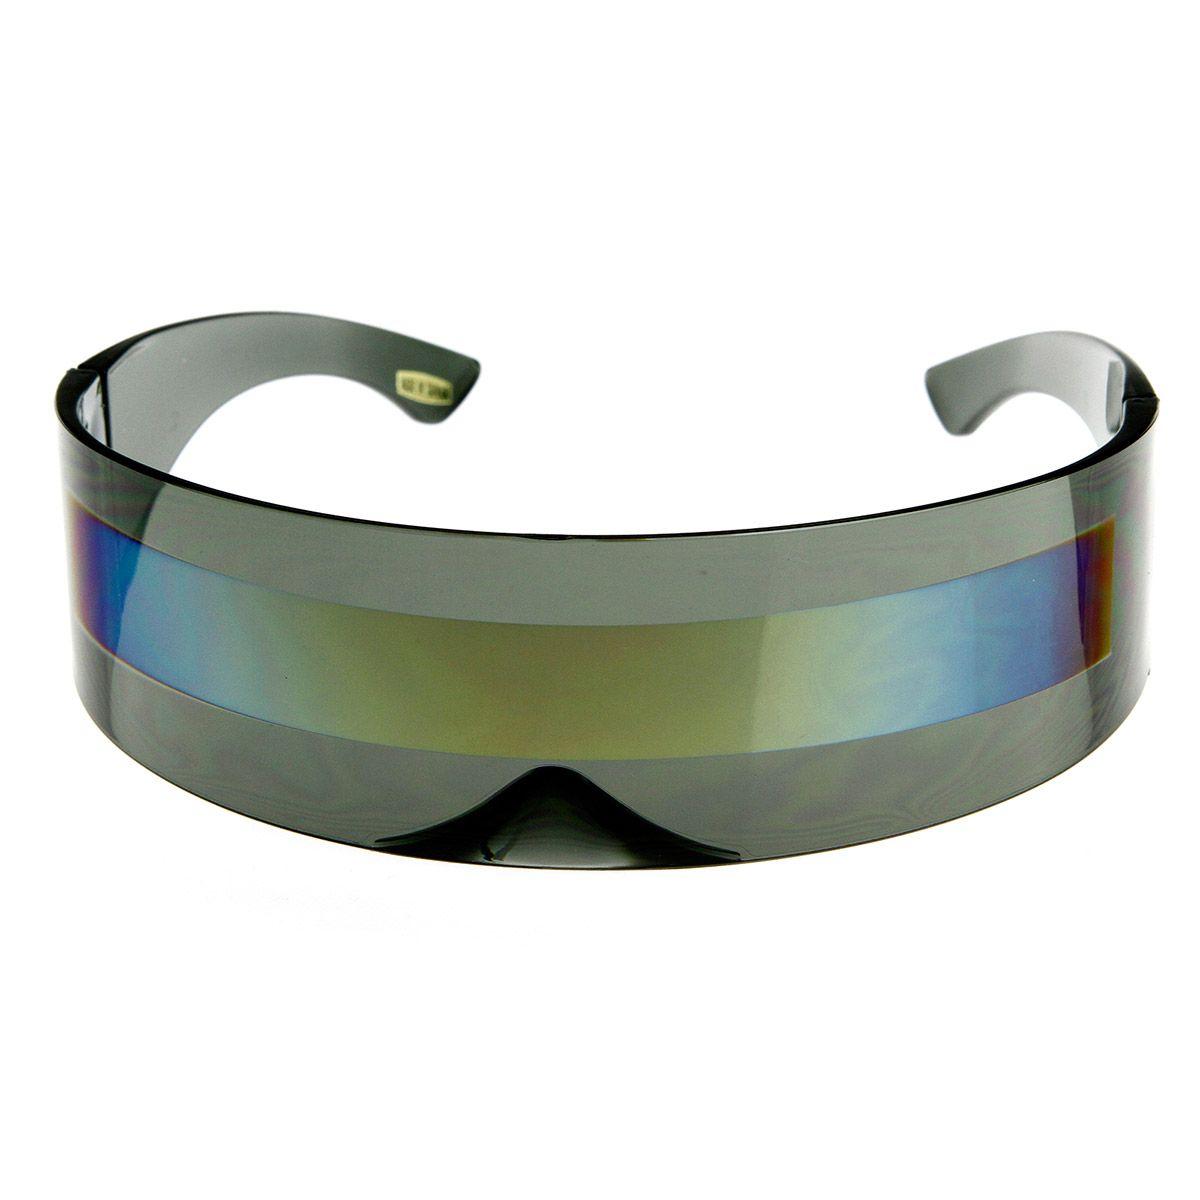 zeroUV - Futuristic Wrap Around Monoblock Shield Sunglasses (Blue) 1uAUtH